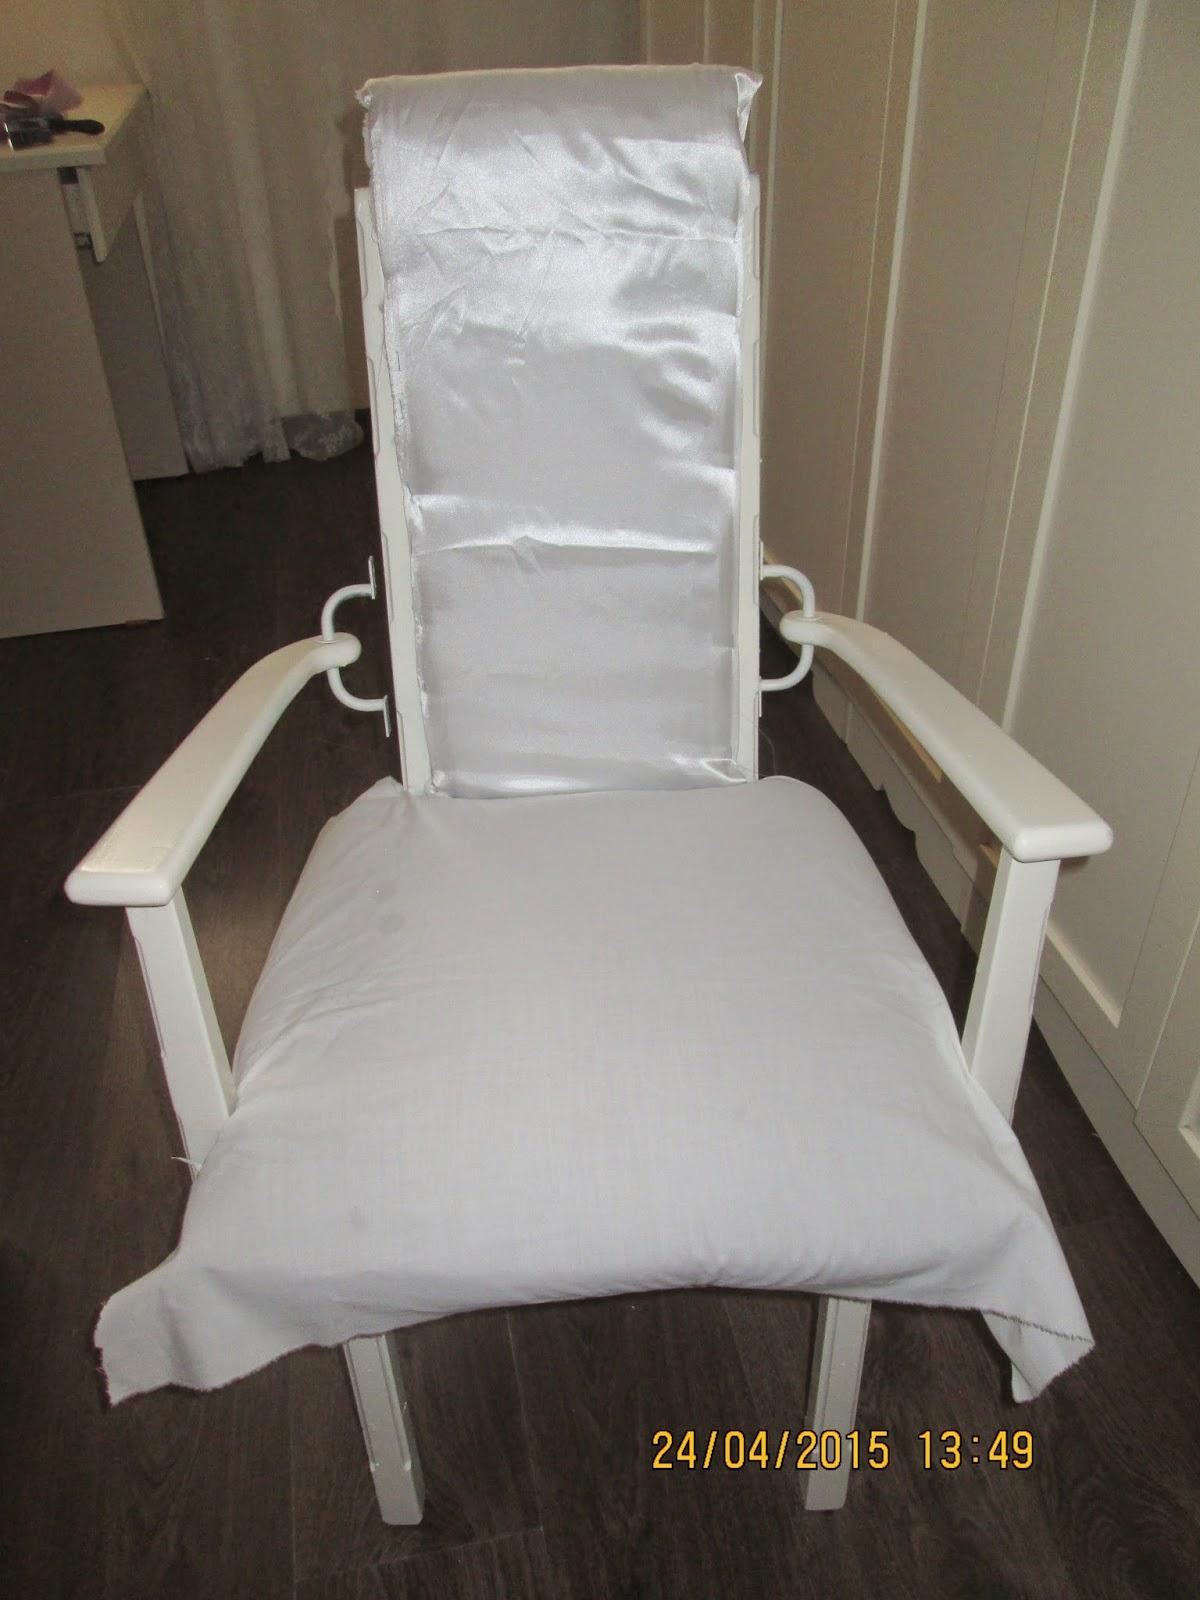 IMG 0048 - שדרוג כורסא ישנה